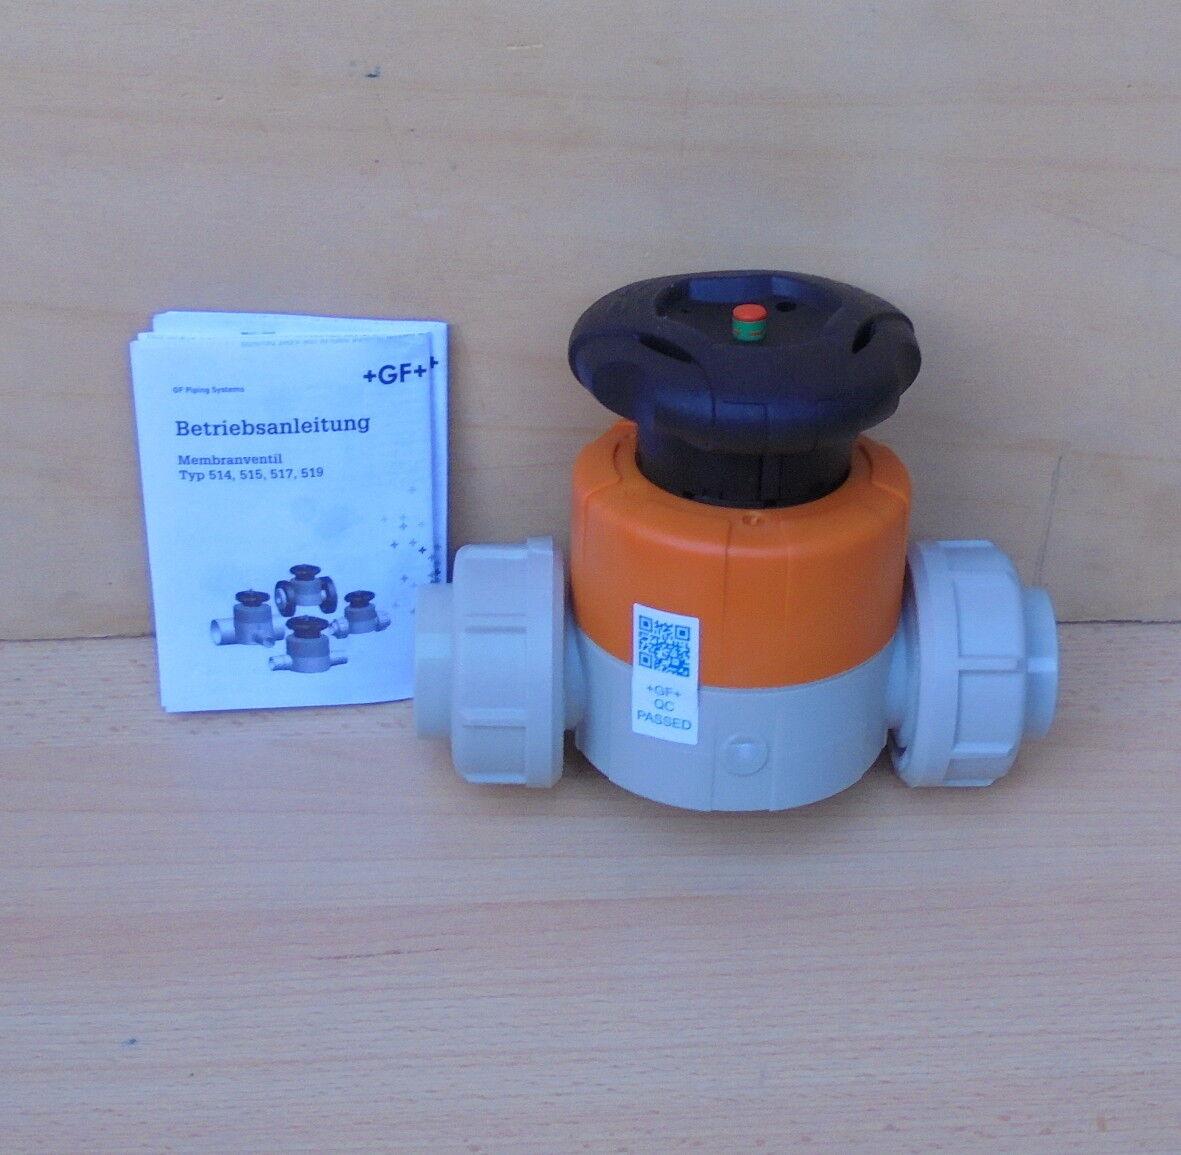 +GF+ Georg Fischer PVC Membranventil Typ 514 d32DN25 167.514.064